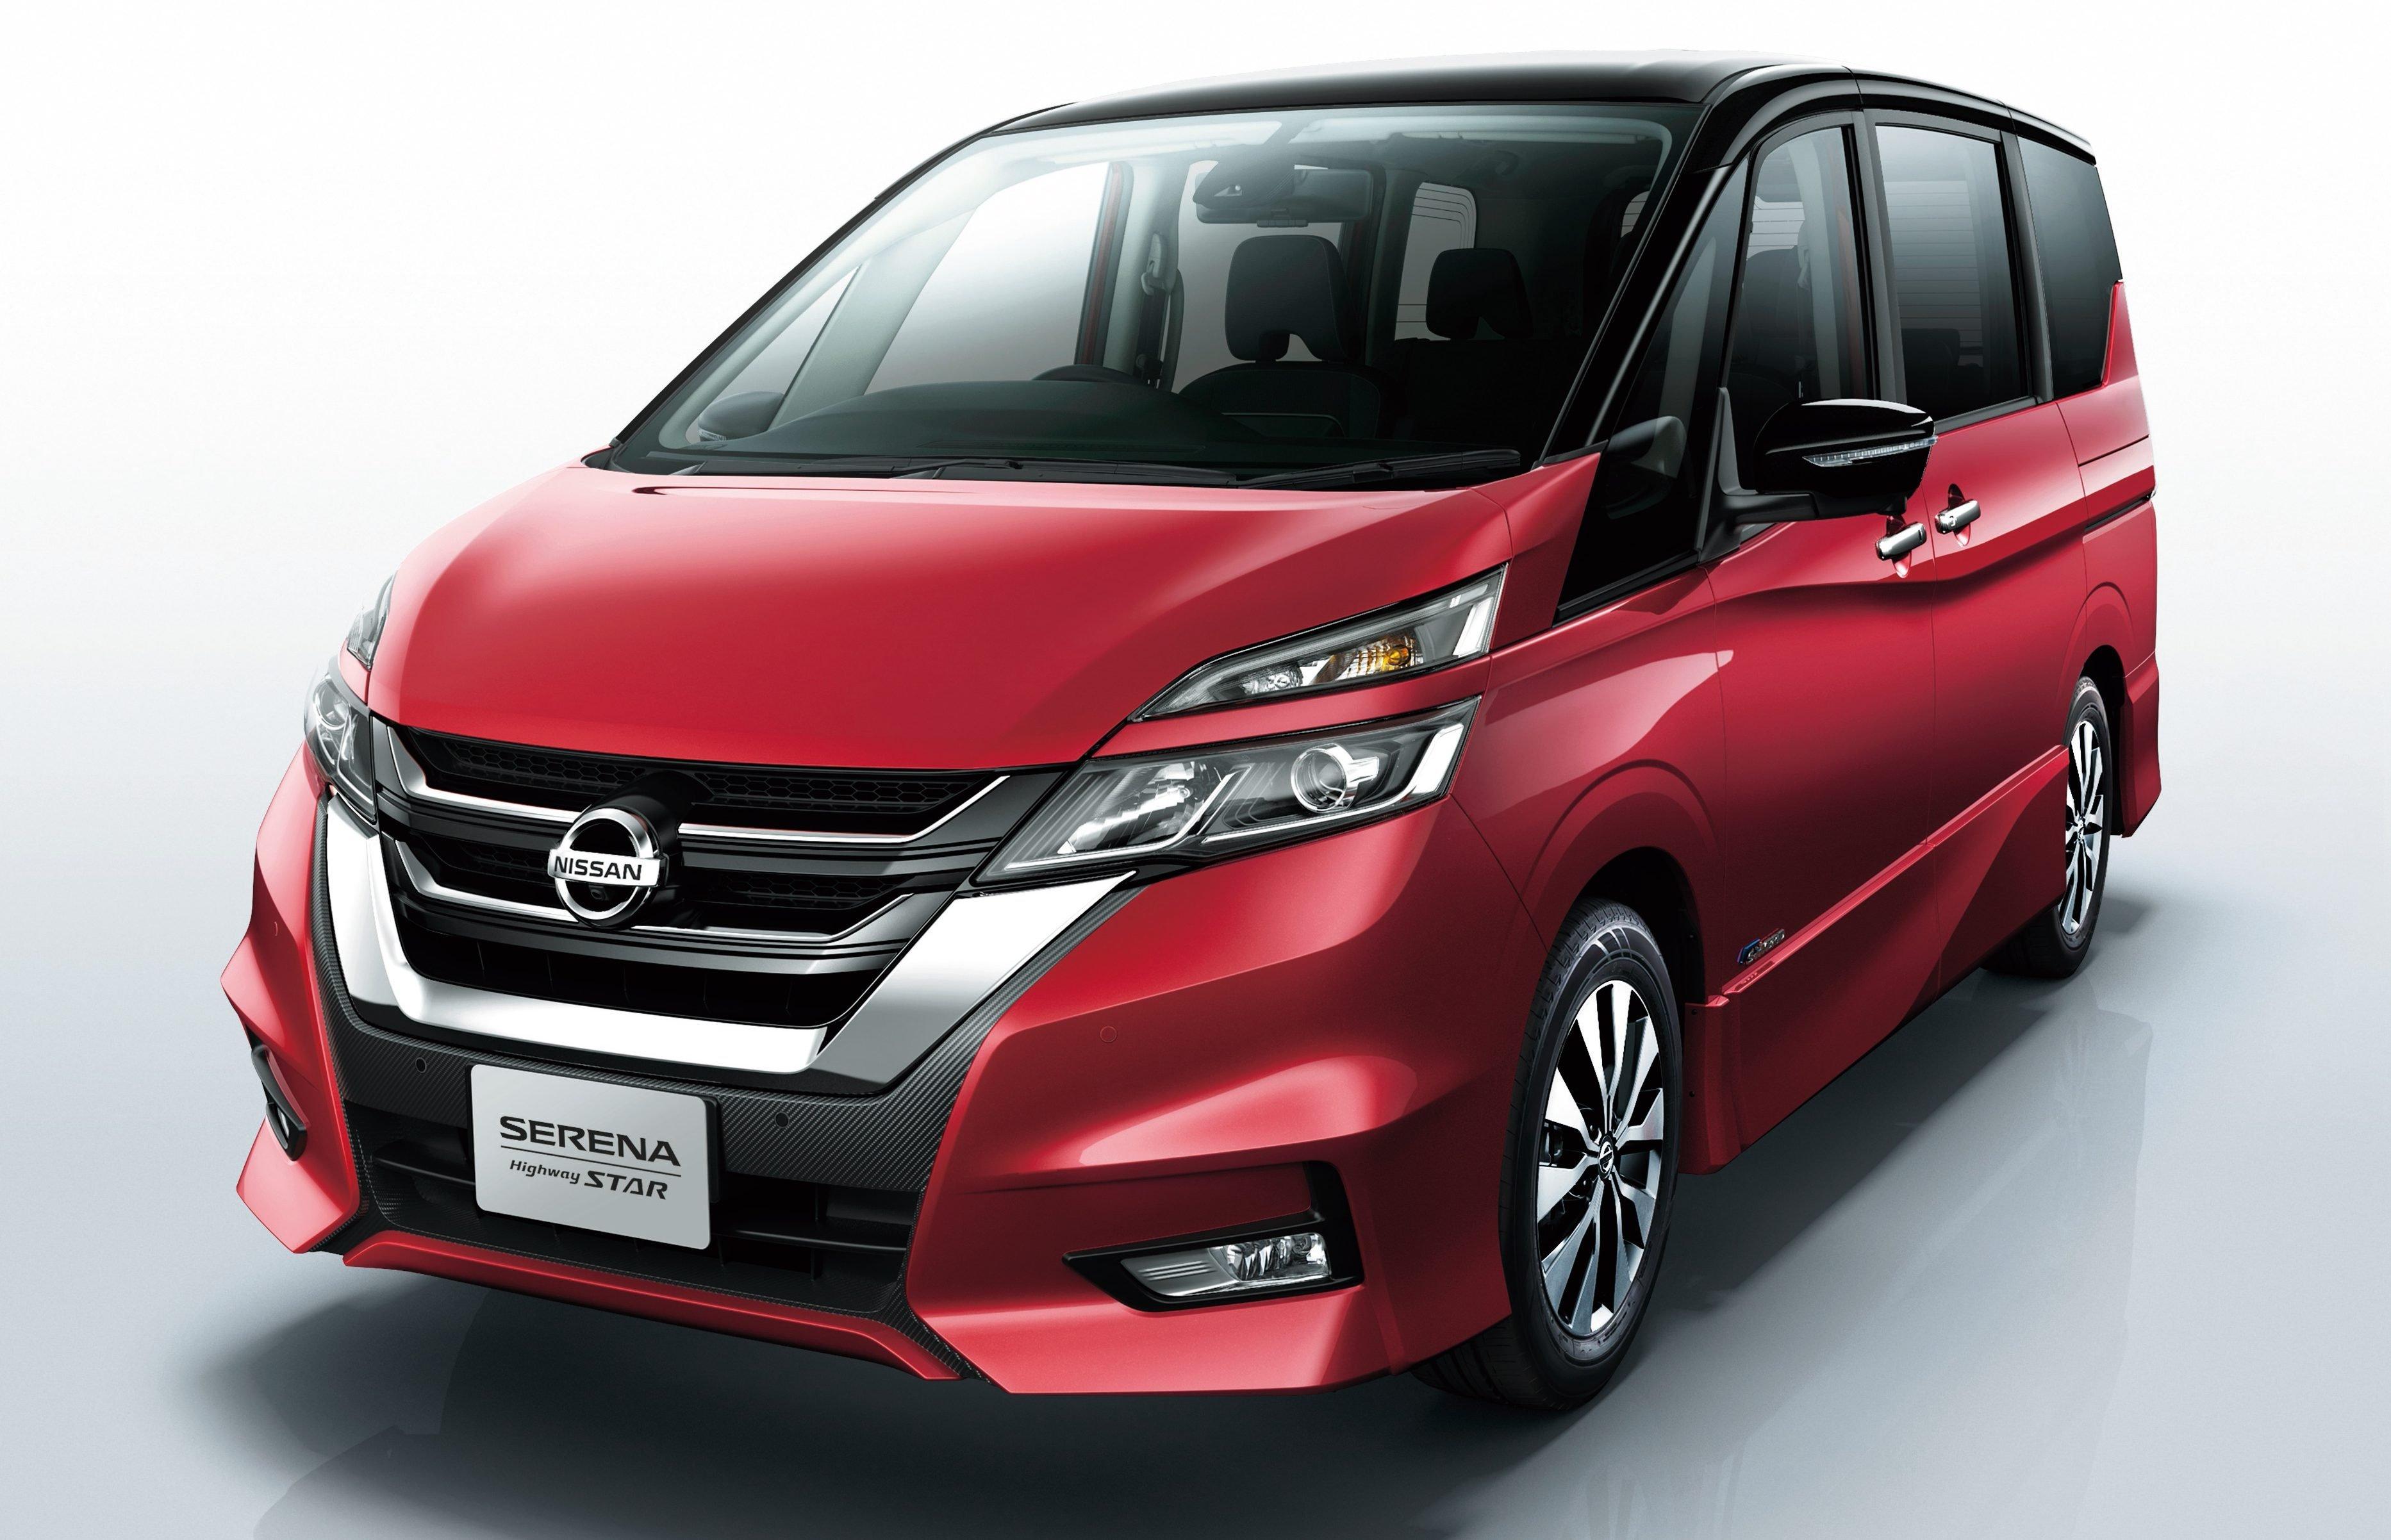 All-new Nissan Serena – fifth-generation model debuts Image 517754